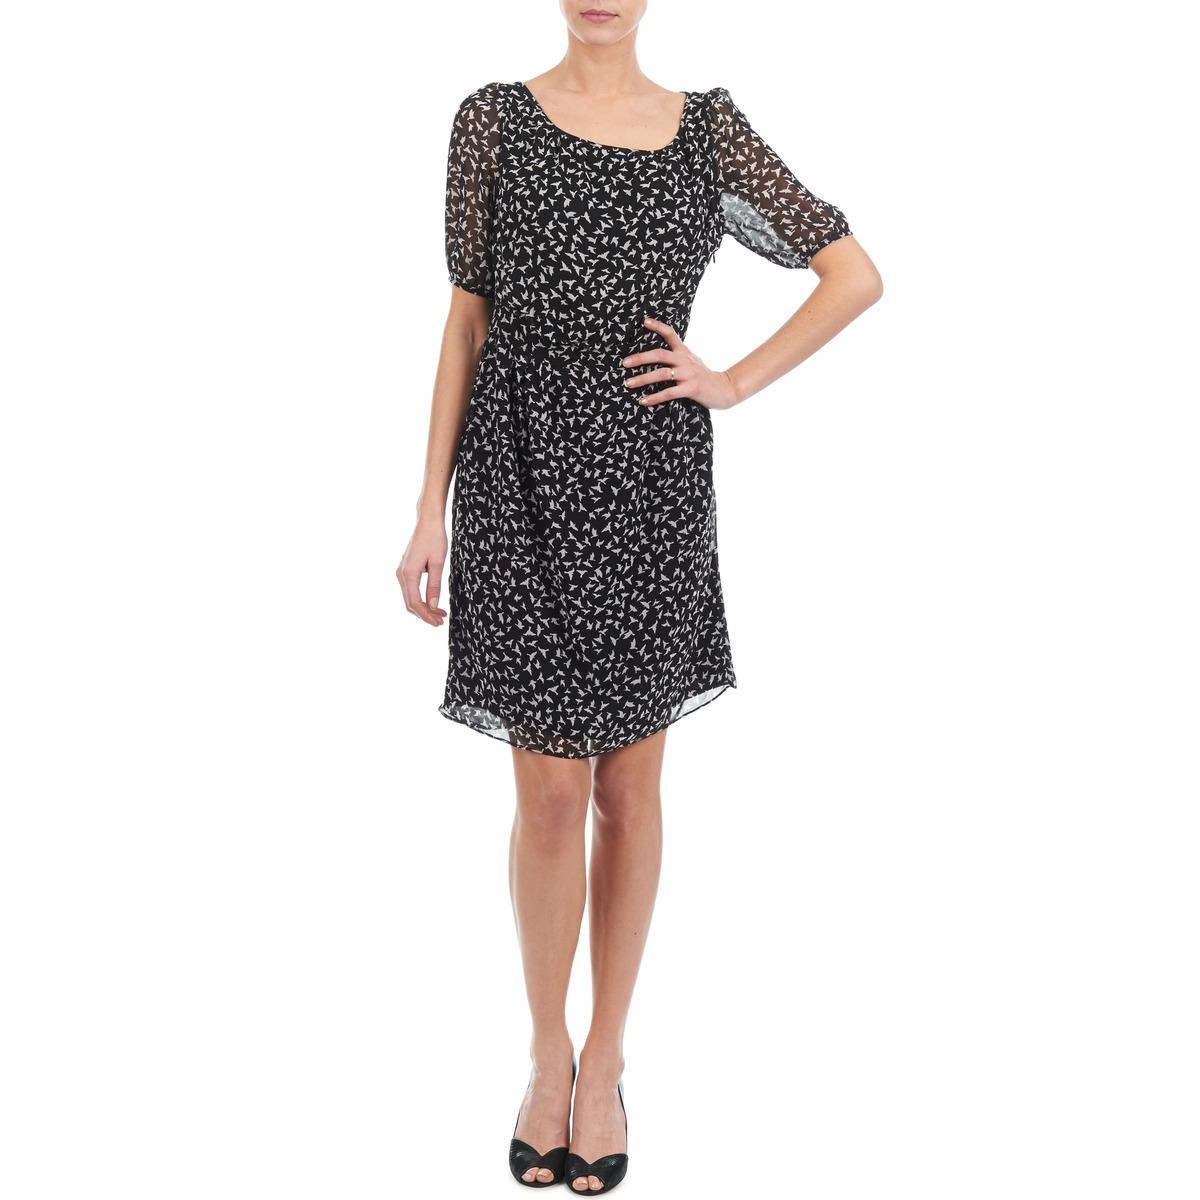 407eabec622 Κοντά Φορέματα Mexx 13LW130 Σύνθεση: Πολυεστέρας, ΓΥΝΑΙΚΑ | ΡΟΥΧΑ |  ΦΟΡΕΜΑΤΑ | ΚΟΝΤΑ